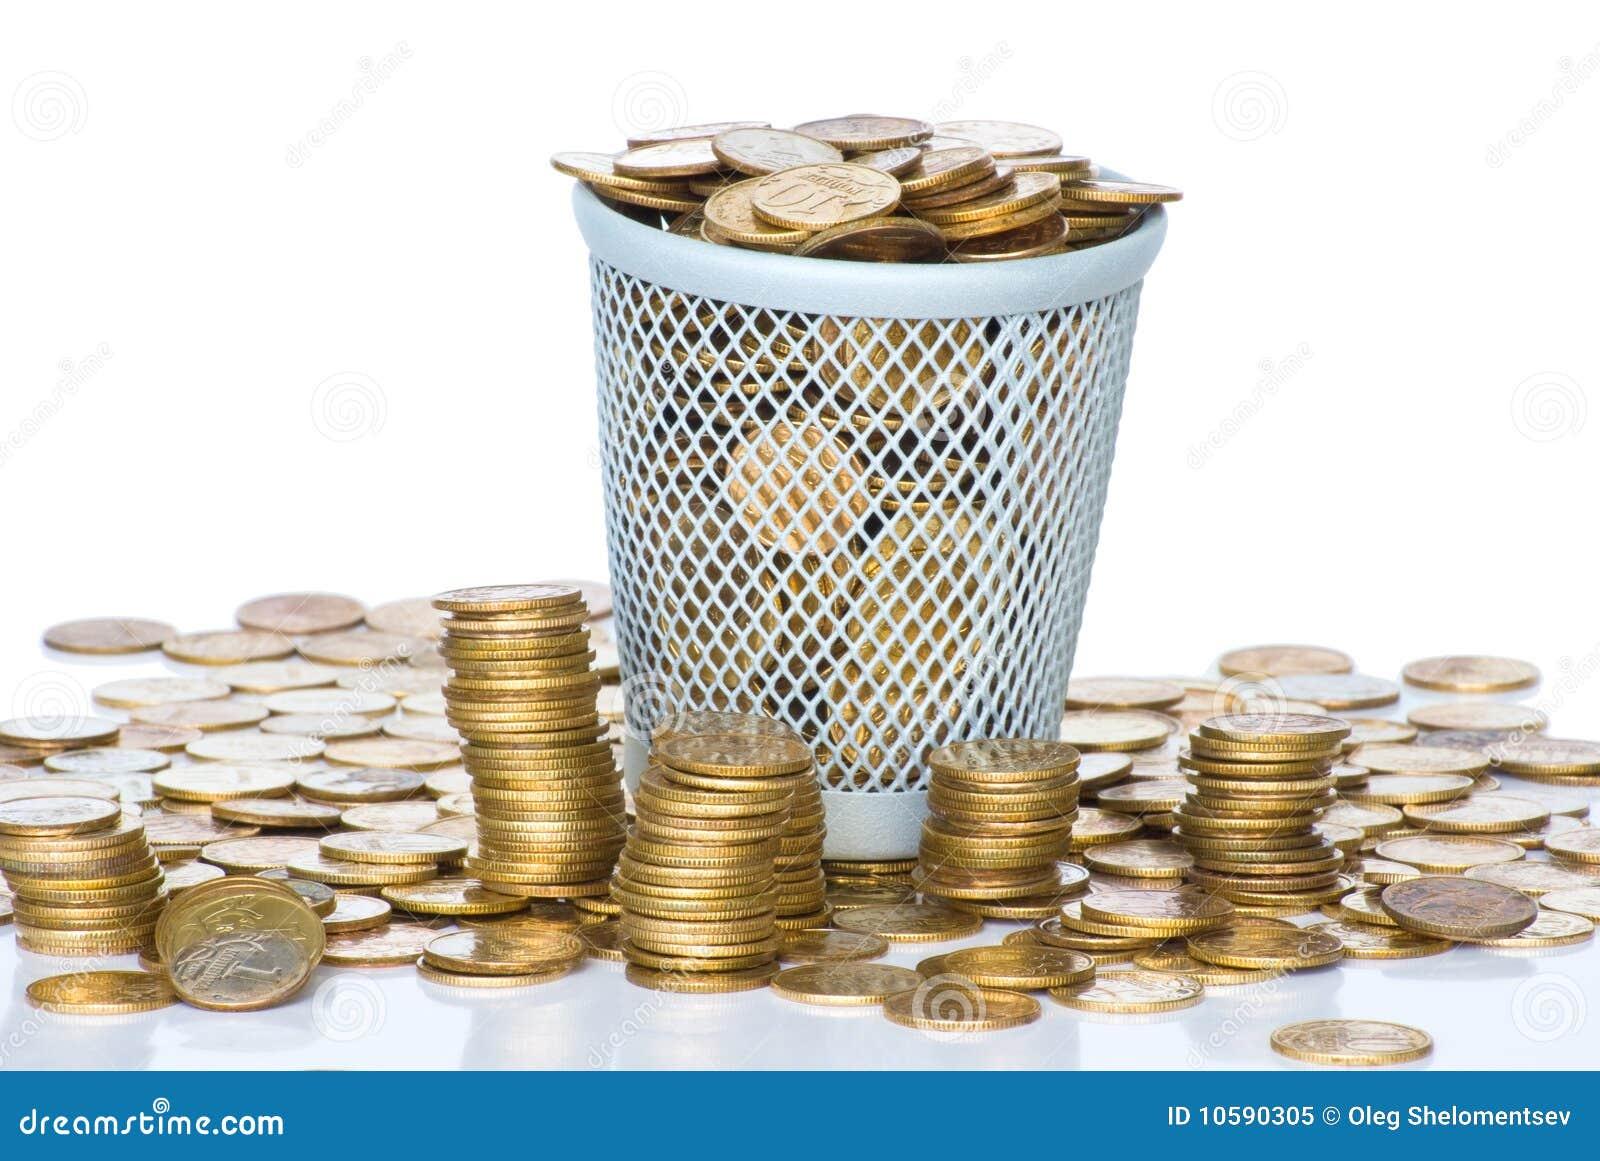 how to make heaps of money on rocituzens